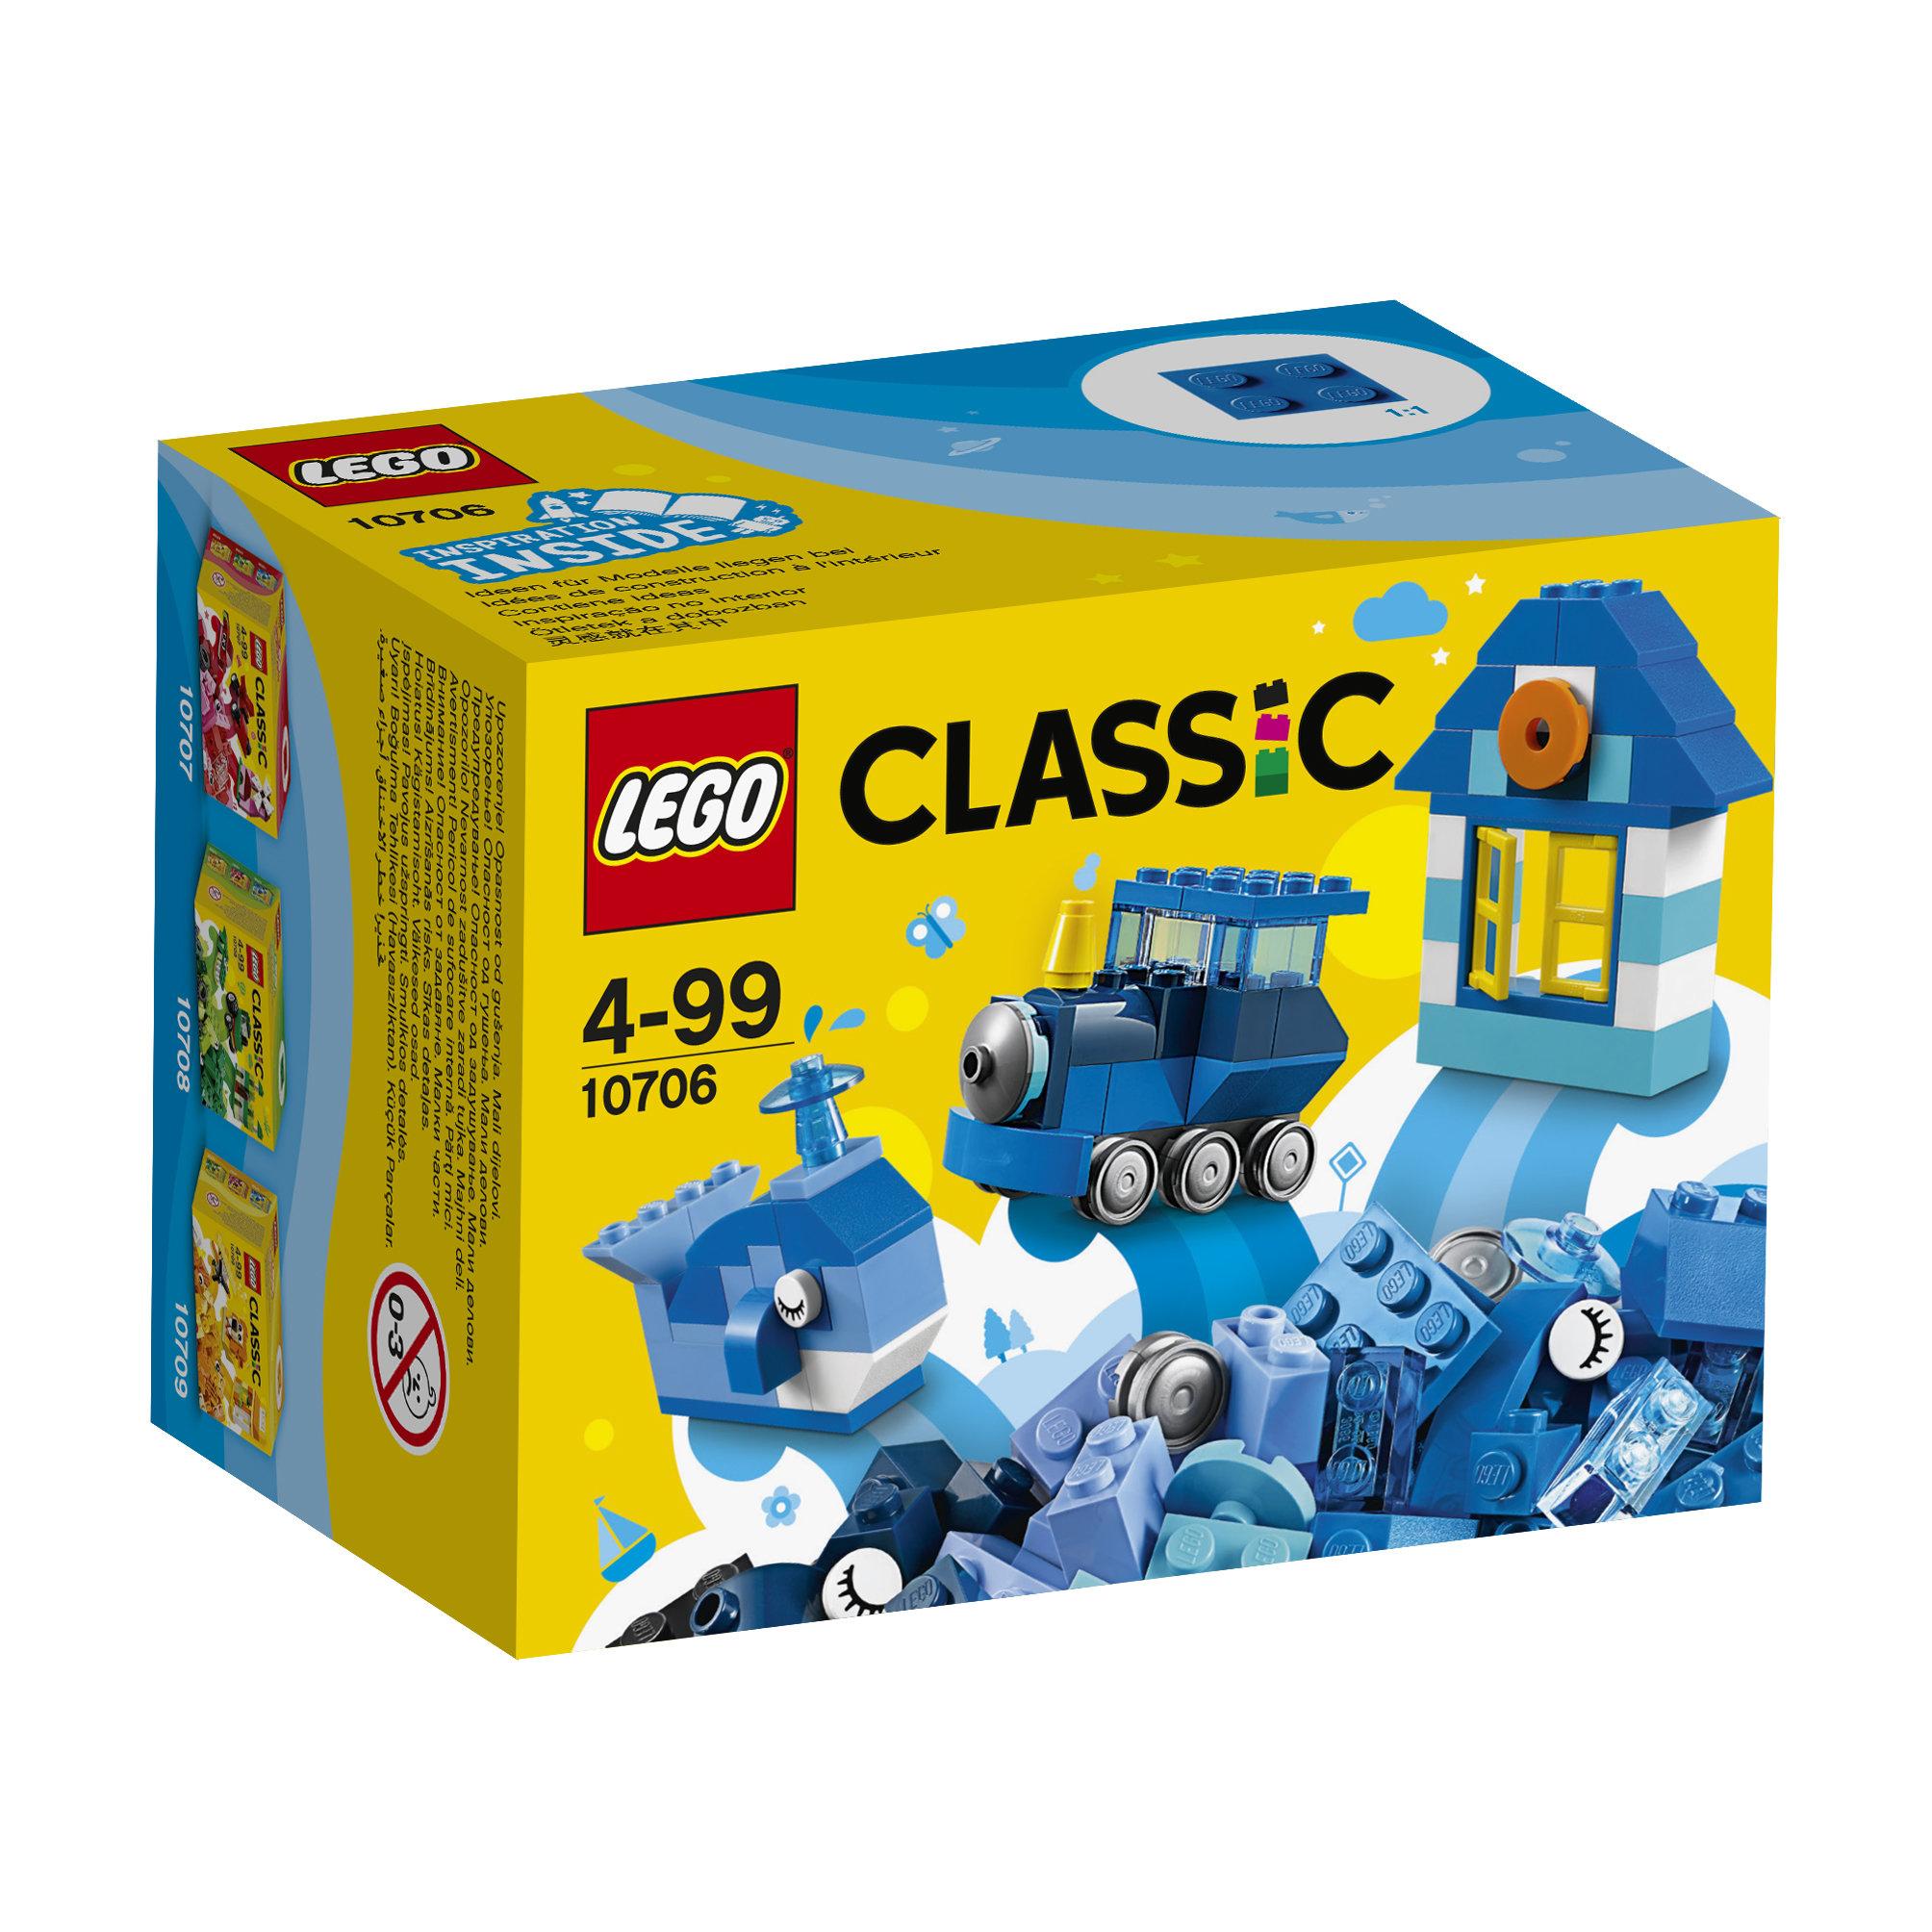 10706 LEGO® CLASSIC Mėlynoji kūrybos dėžutė